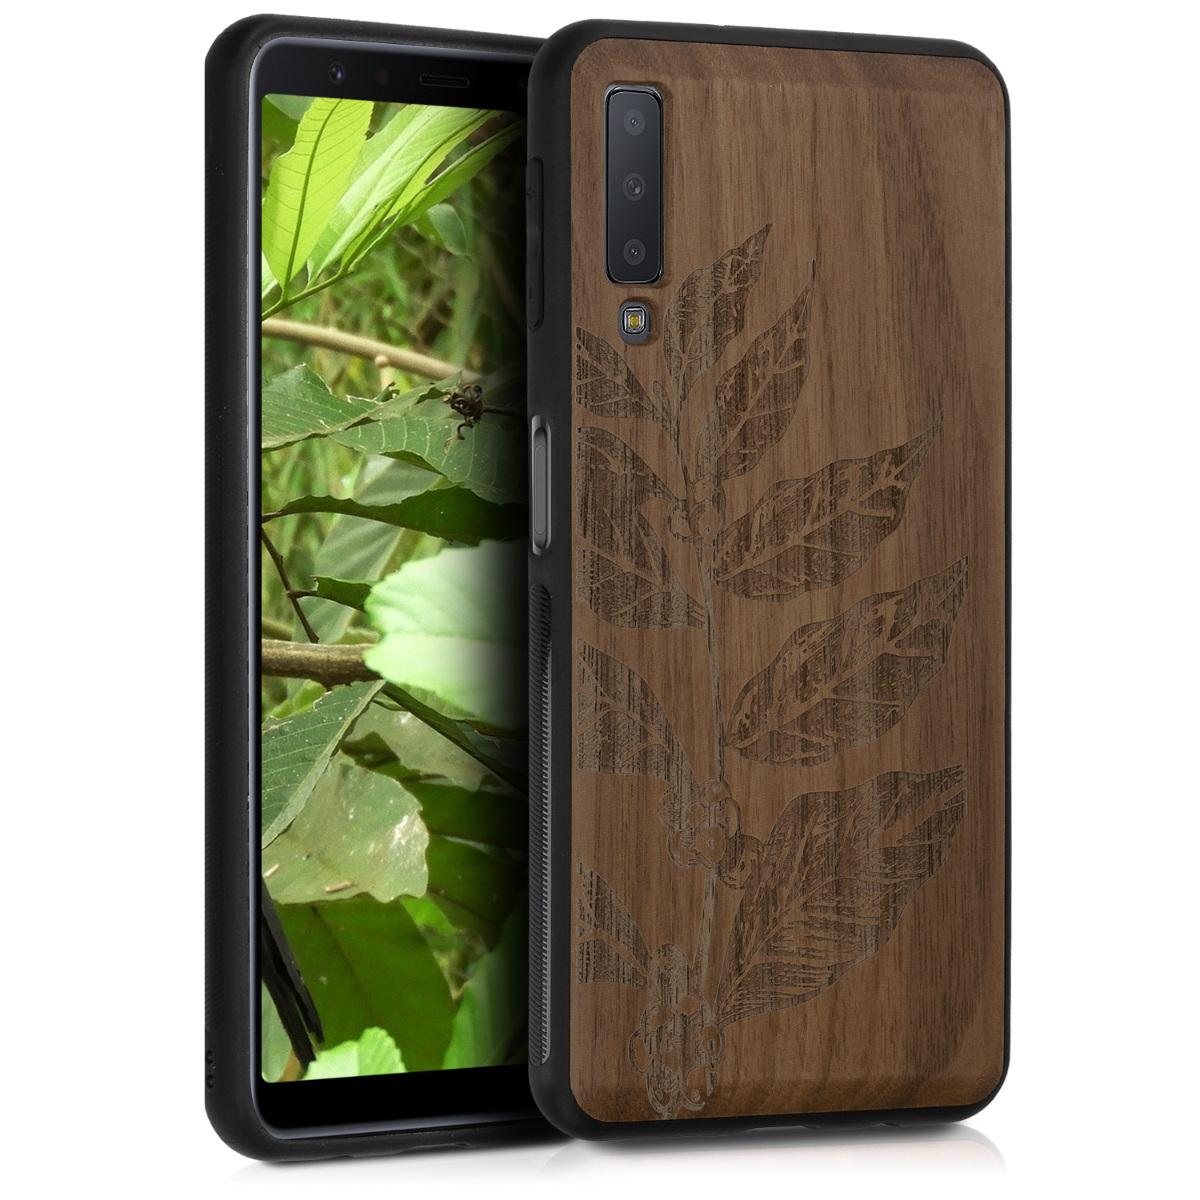 KW Ξύλινη Θήκη Samsung Galaxy A7 2018 - Καφέ/ Σχέδιο φύλλα (47239.01)